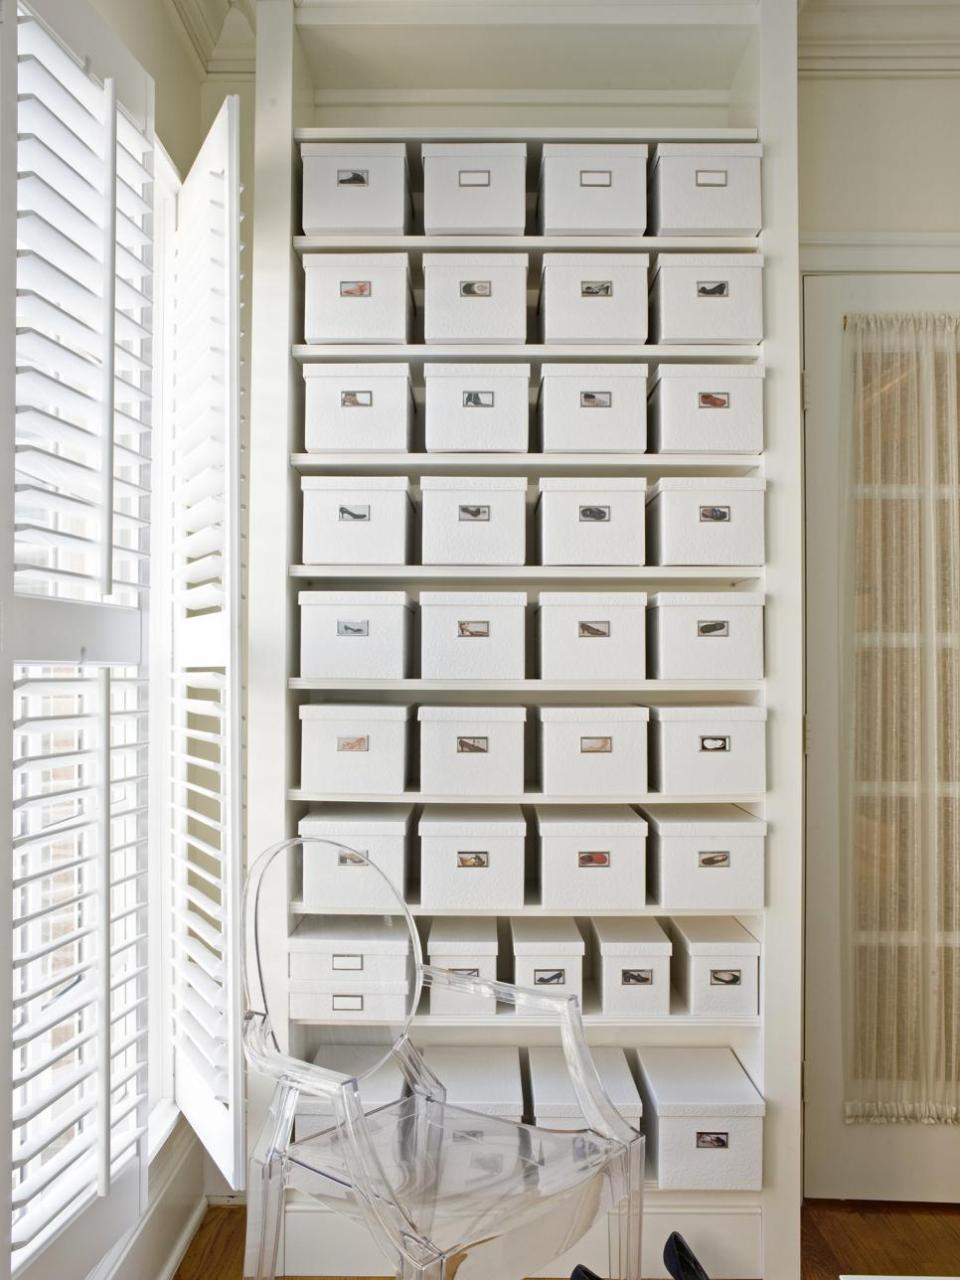 DIY shoe storage // Organized closets // closet organizing // how to organize your shoes // shoe storage ideas // sleek home design ideas // shoe storage // high end shoe boxes // www.SimplySpaced.com